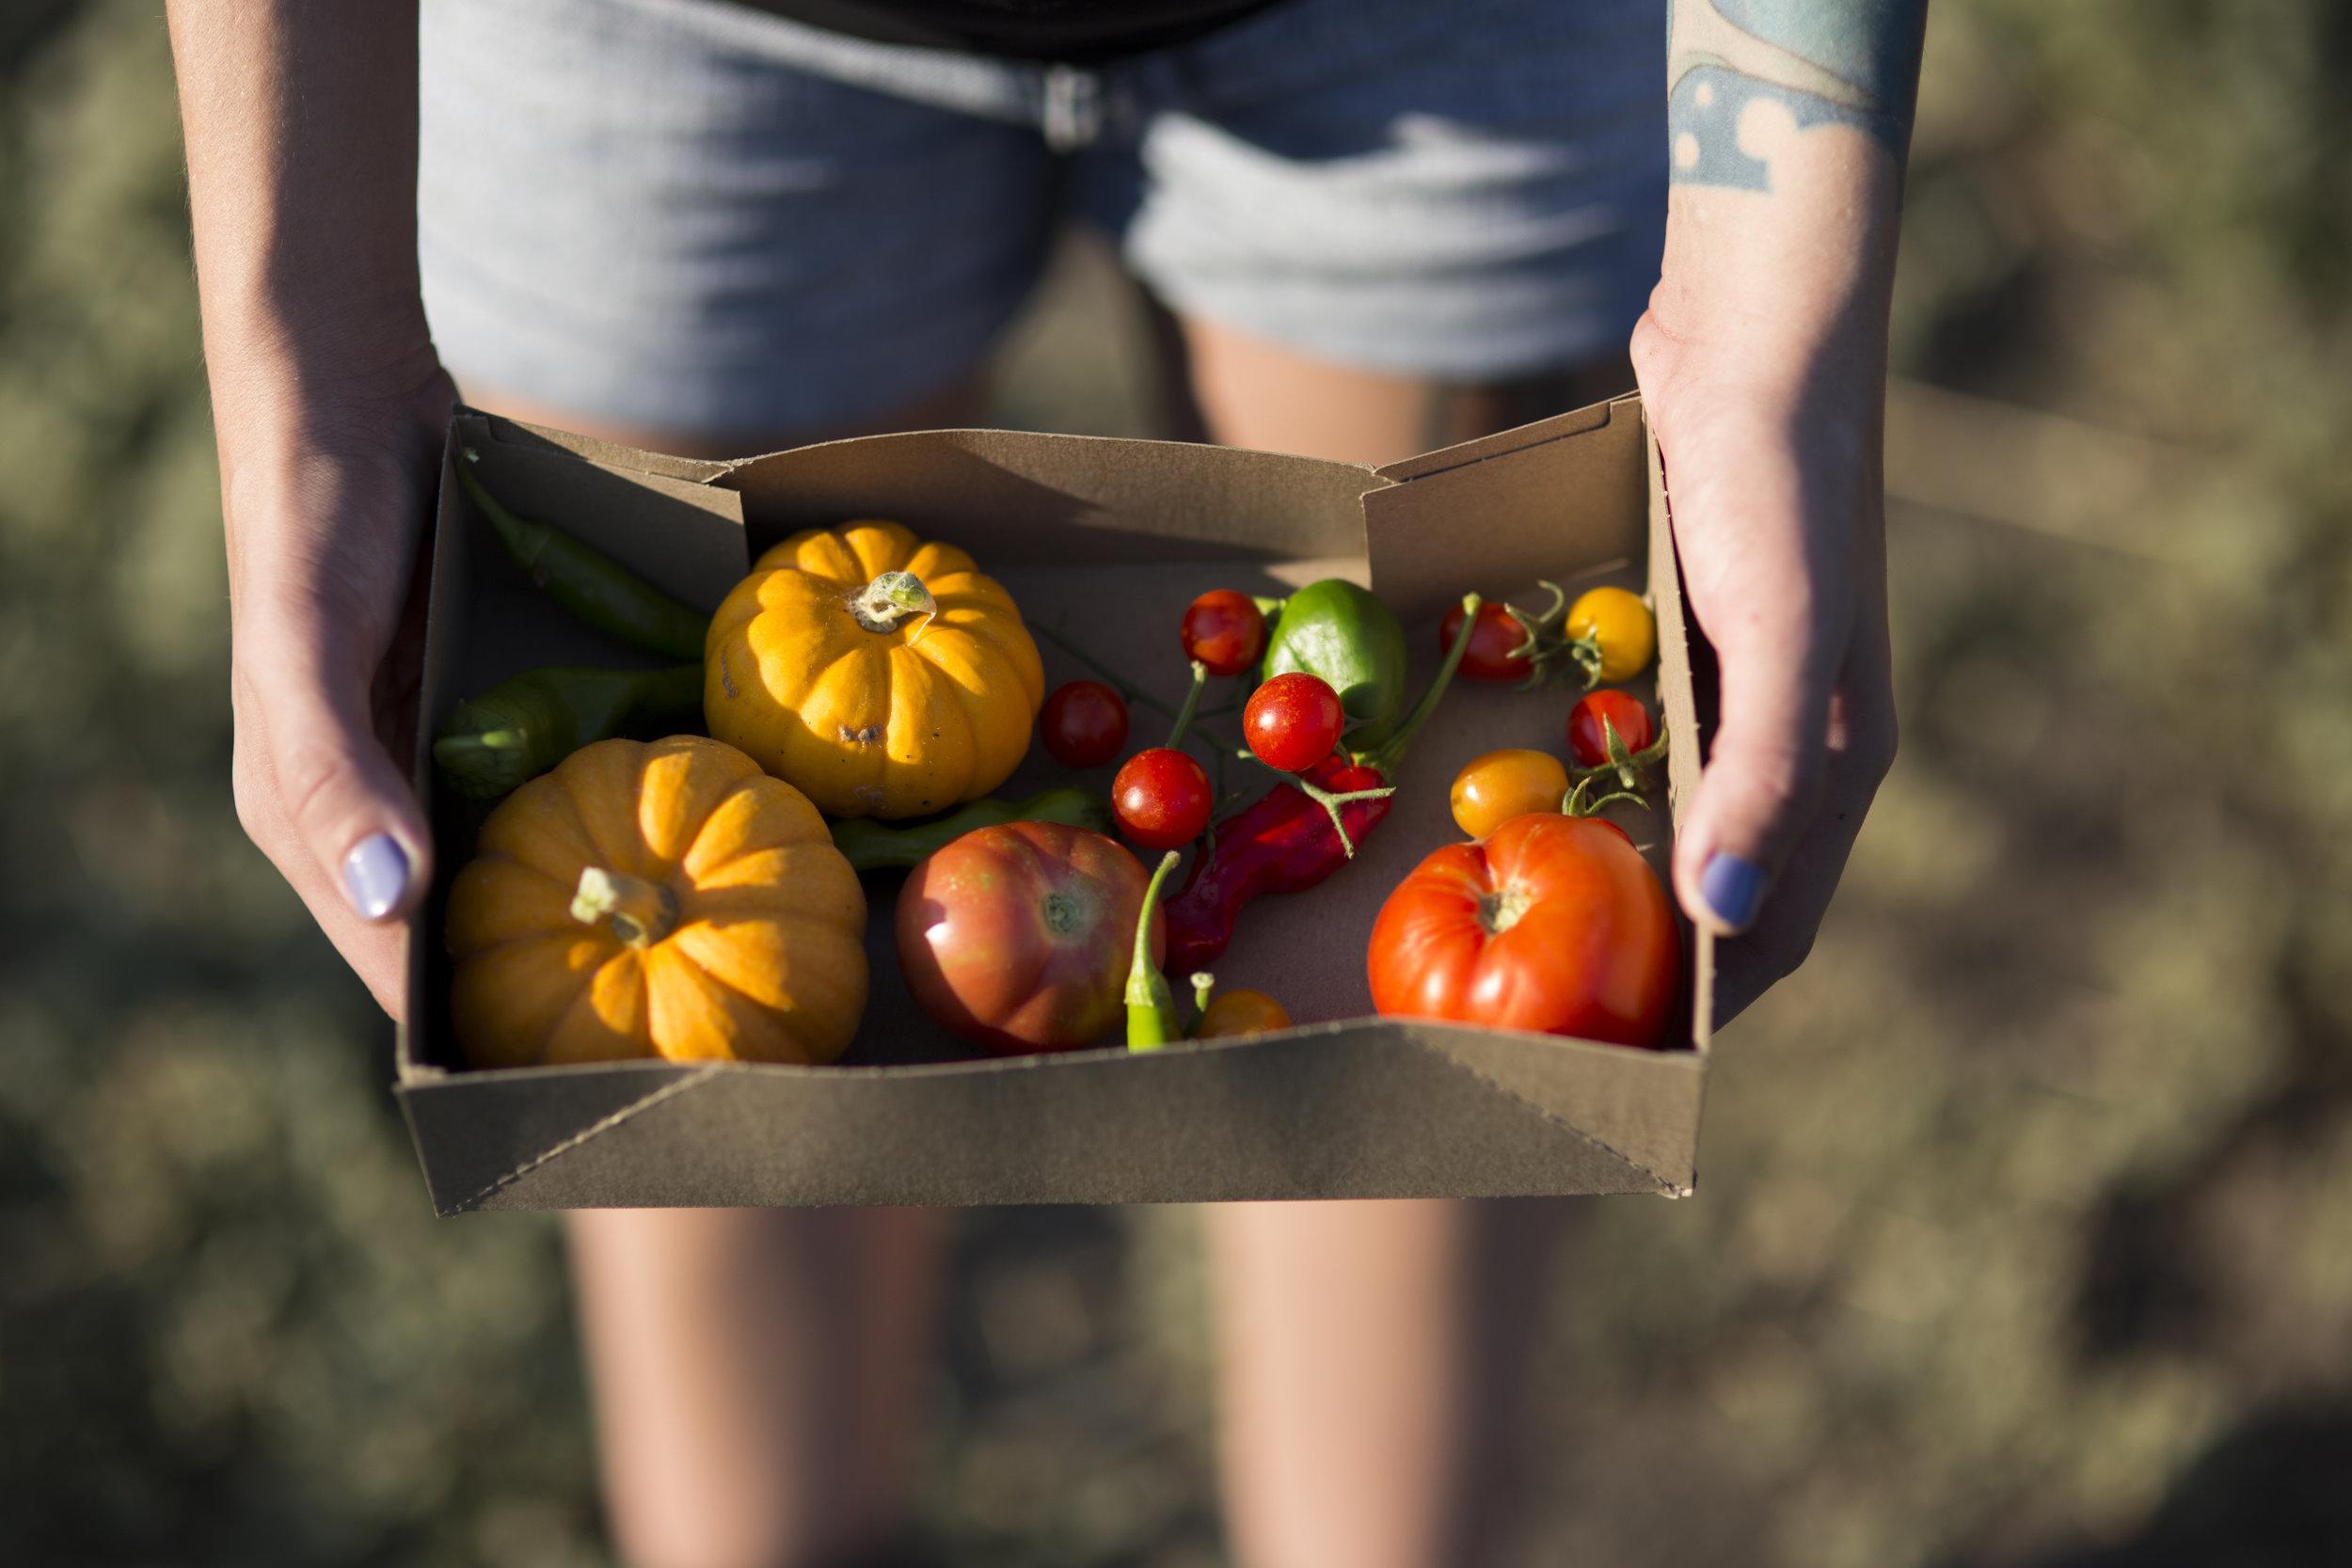 SFF Tomatoes and veggies.jpg